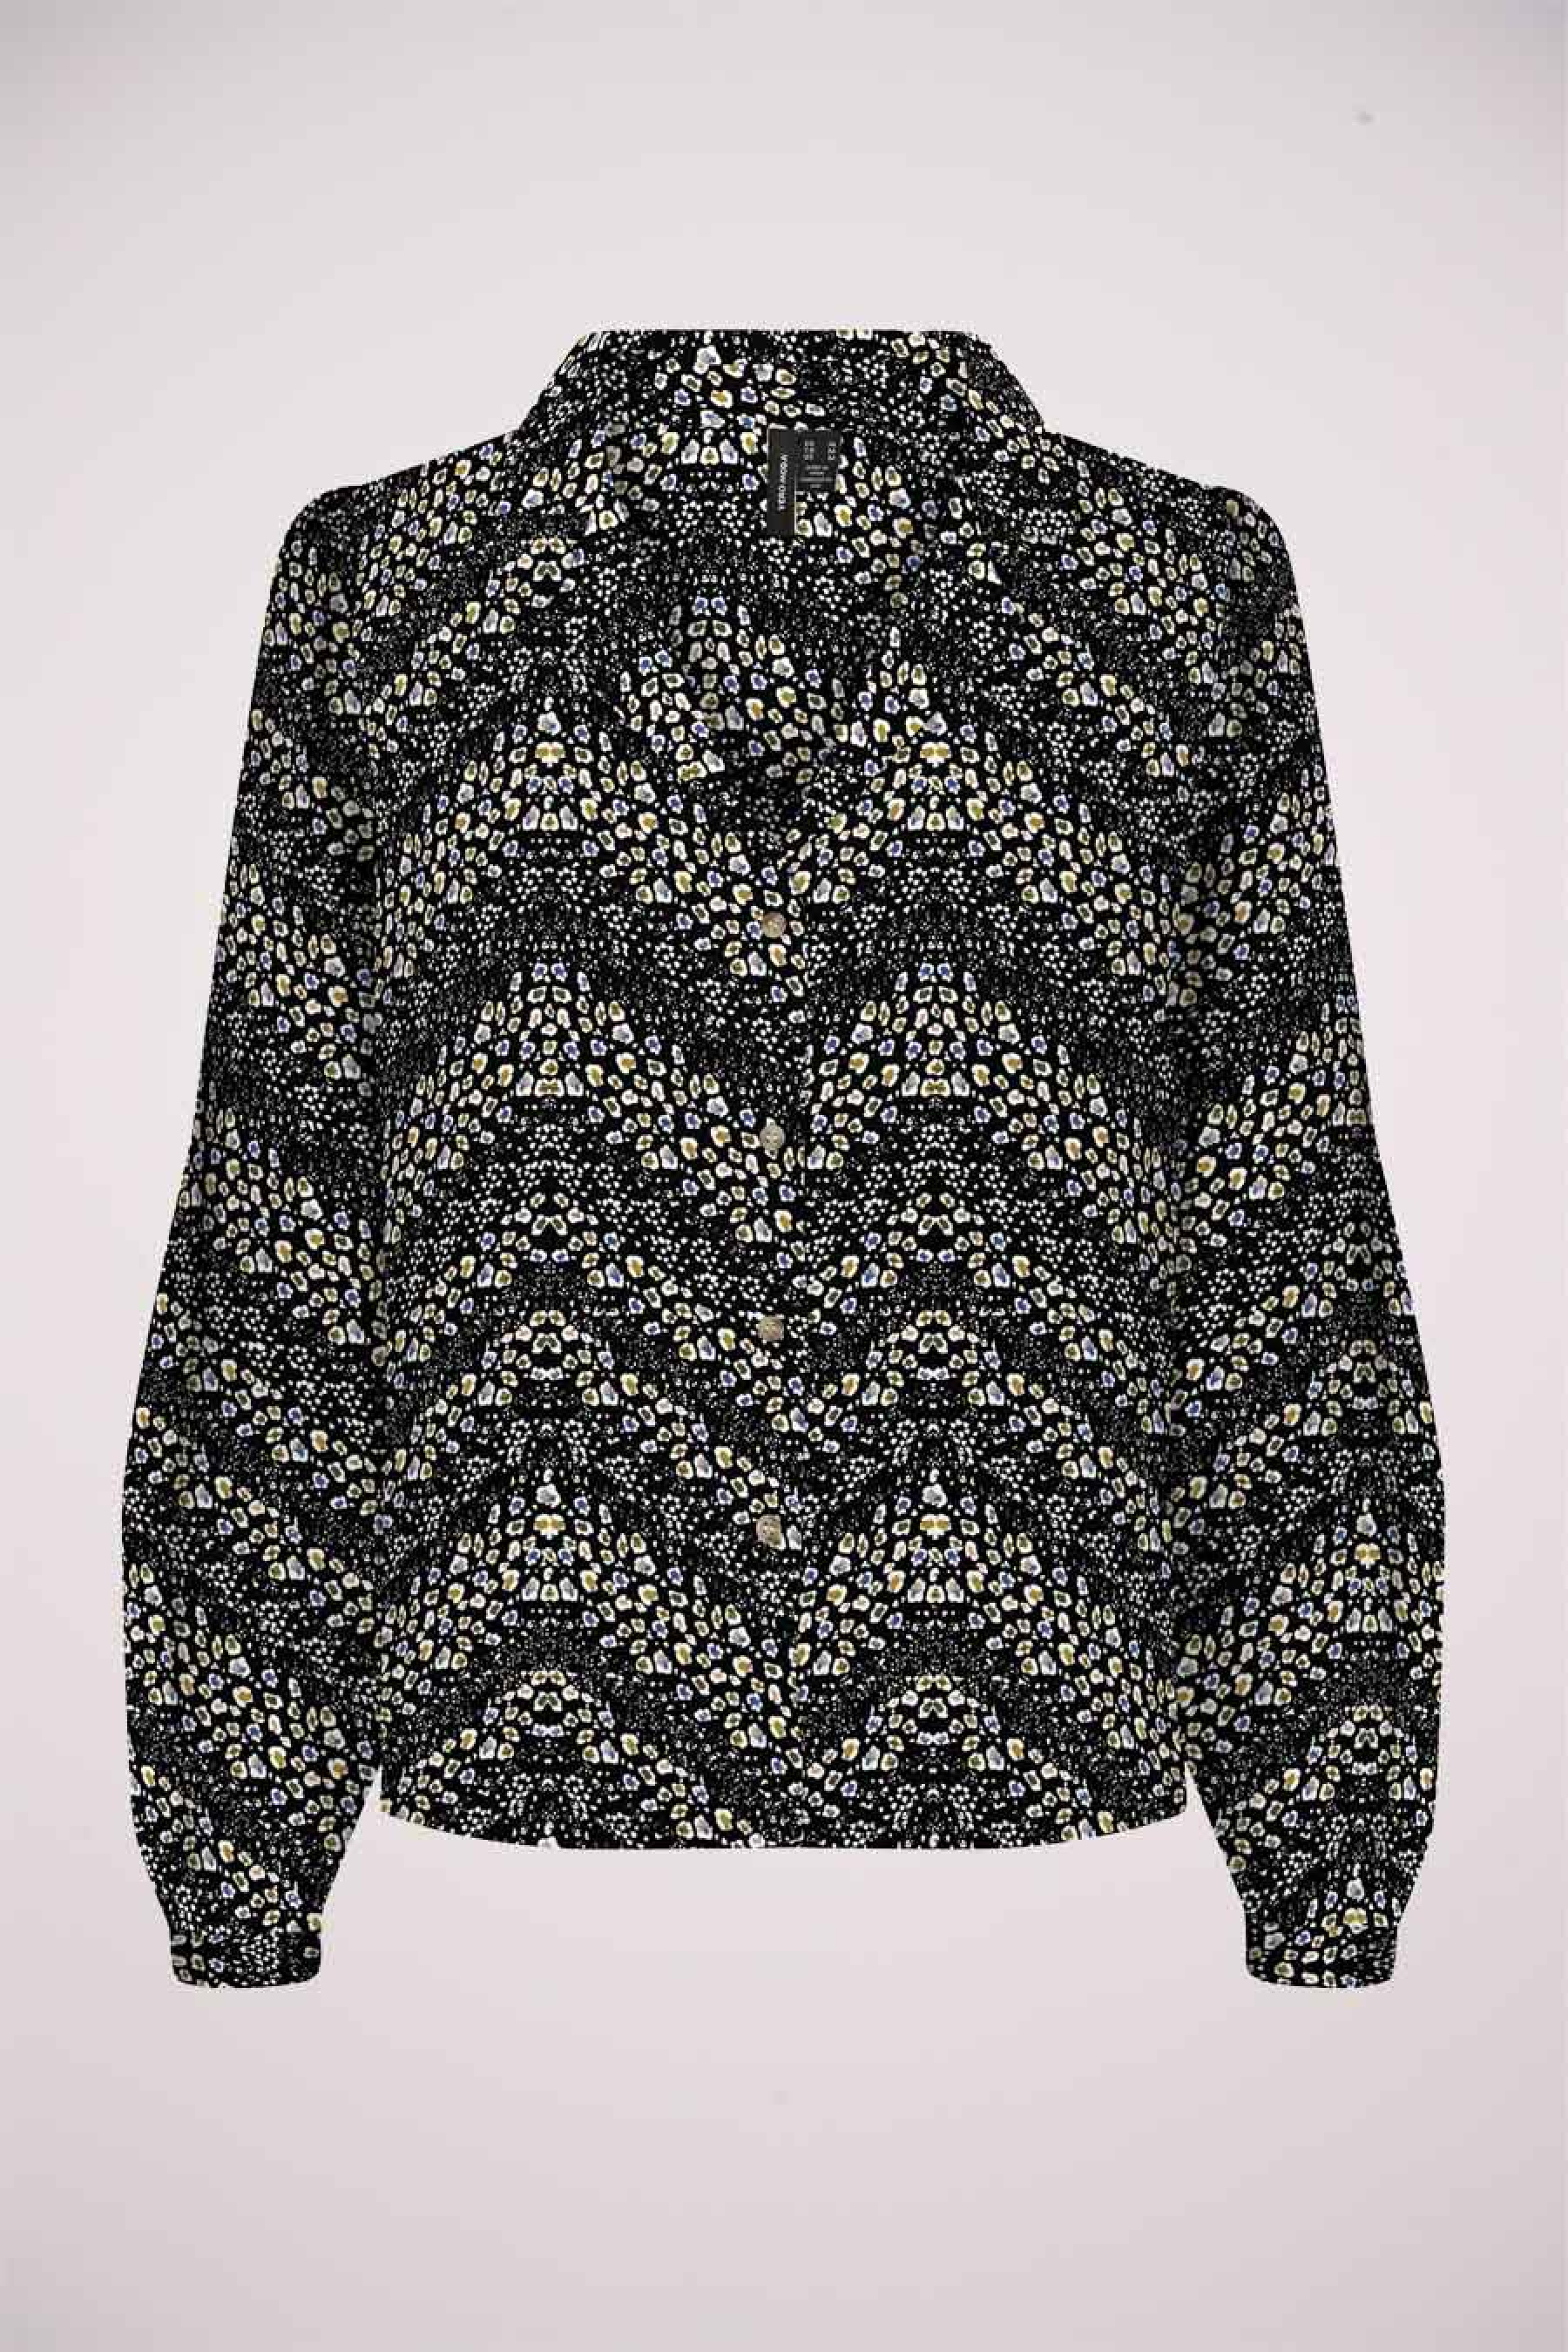 Vero Moda® Blouse lange mouwen, Zwart, Dames, Maat: L/M/S/XL/XS